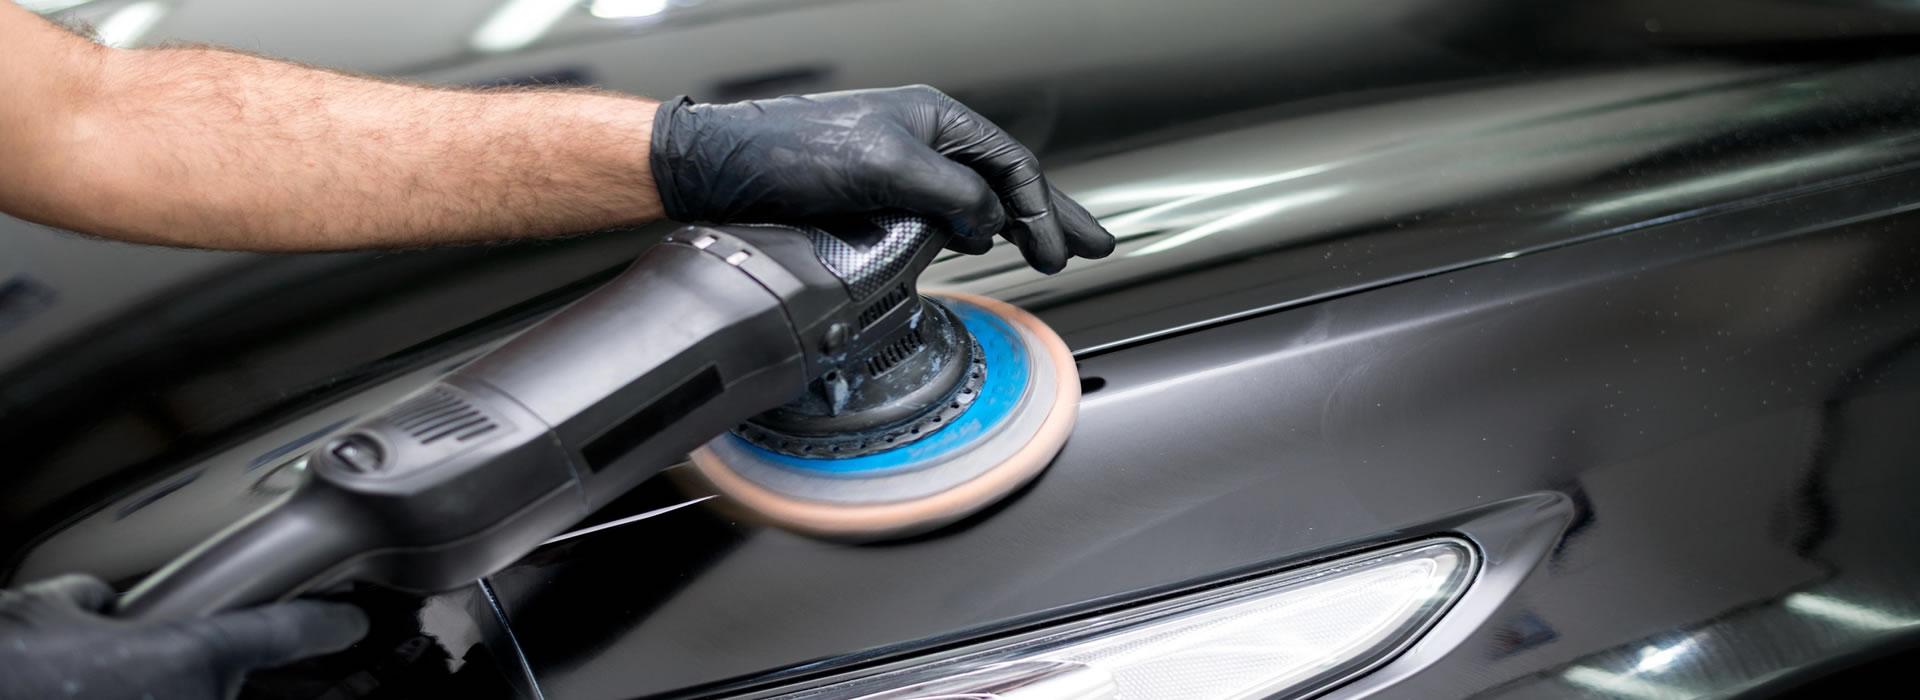 Westfield Auto Body Repairs Villawood